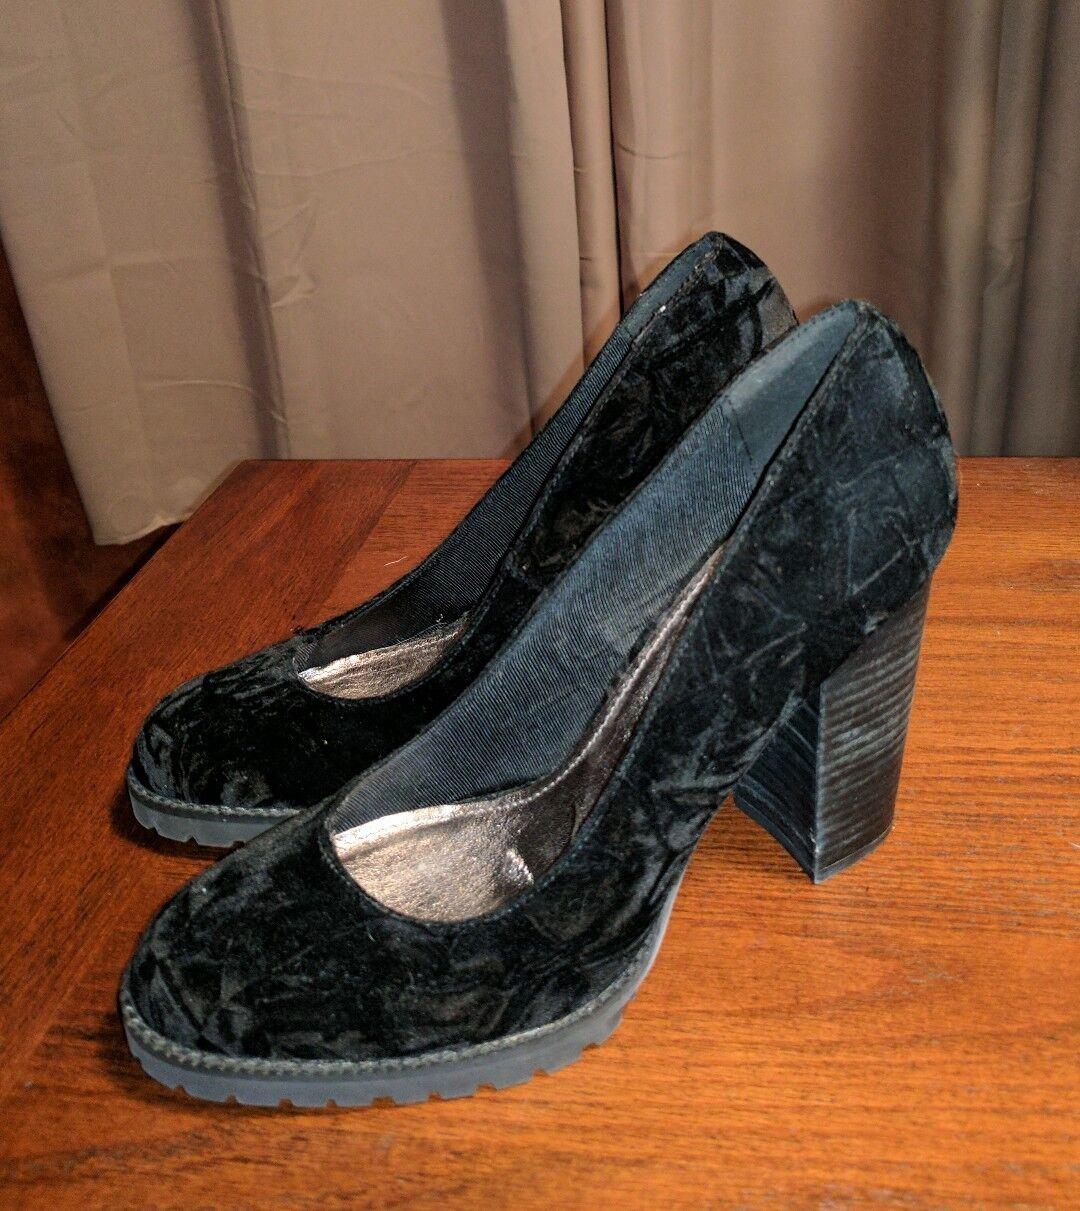 NEU MATISSE JASS CRUSH VELVET HEELS BLACK Schuhe CLASSIC CHUNKY 7.5M